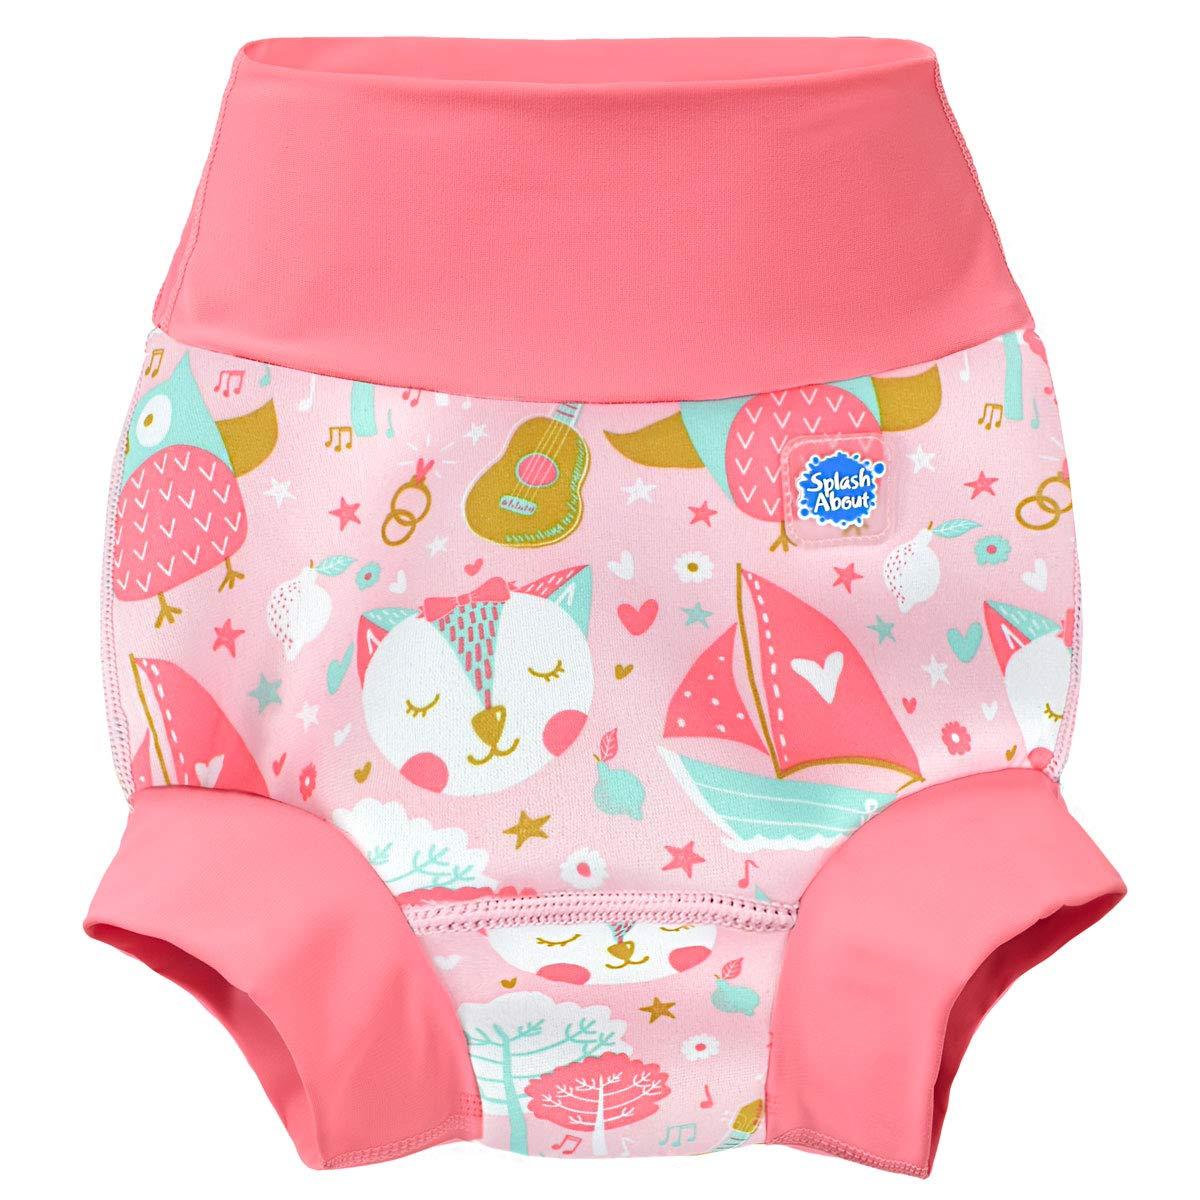 Splash About Unisex Baby Kids New Improved Happy Nappy